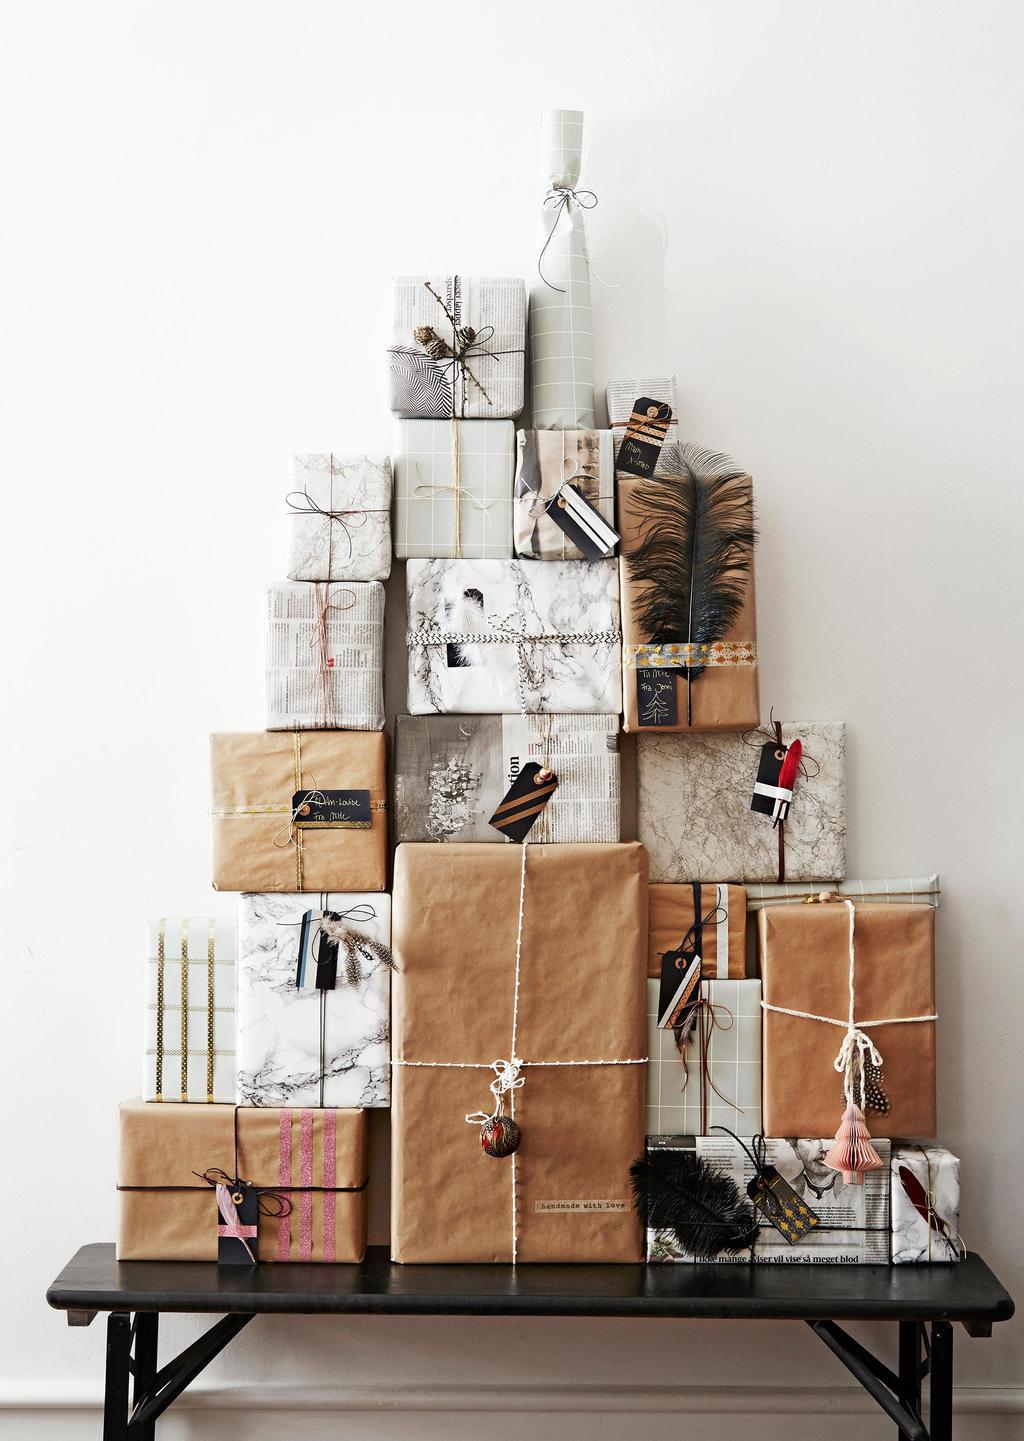 12x cadeaus onder de 20 euro - Ingepakte-cadeautjes - Madam Stoltz